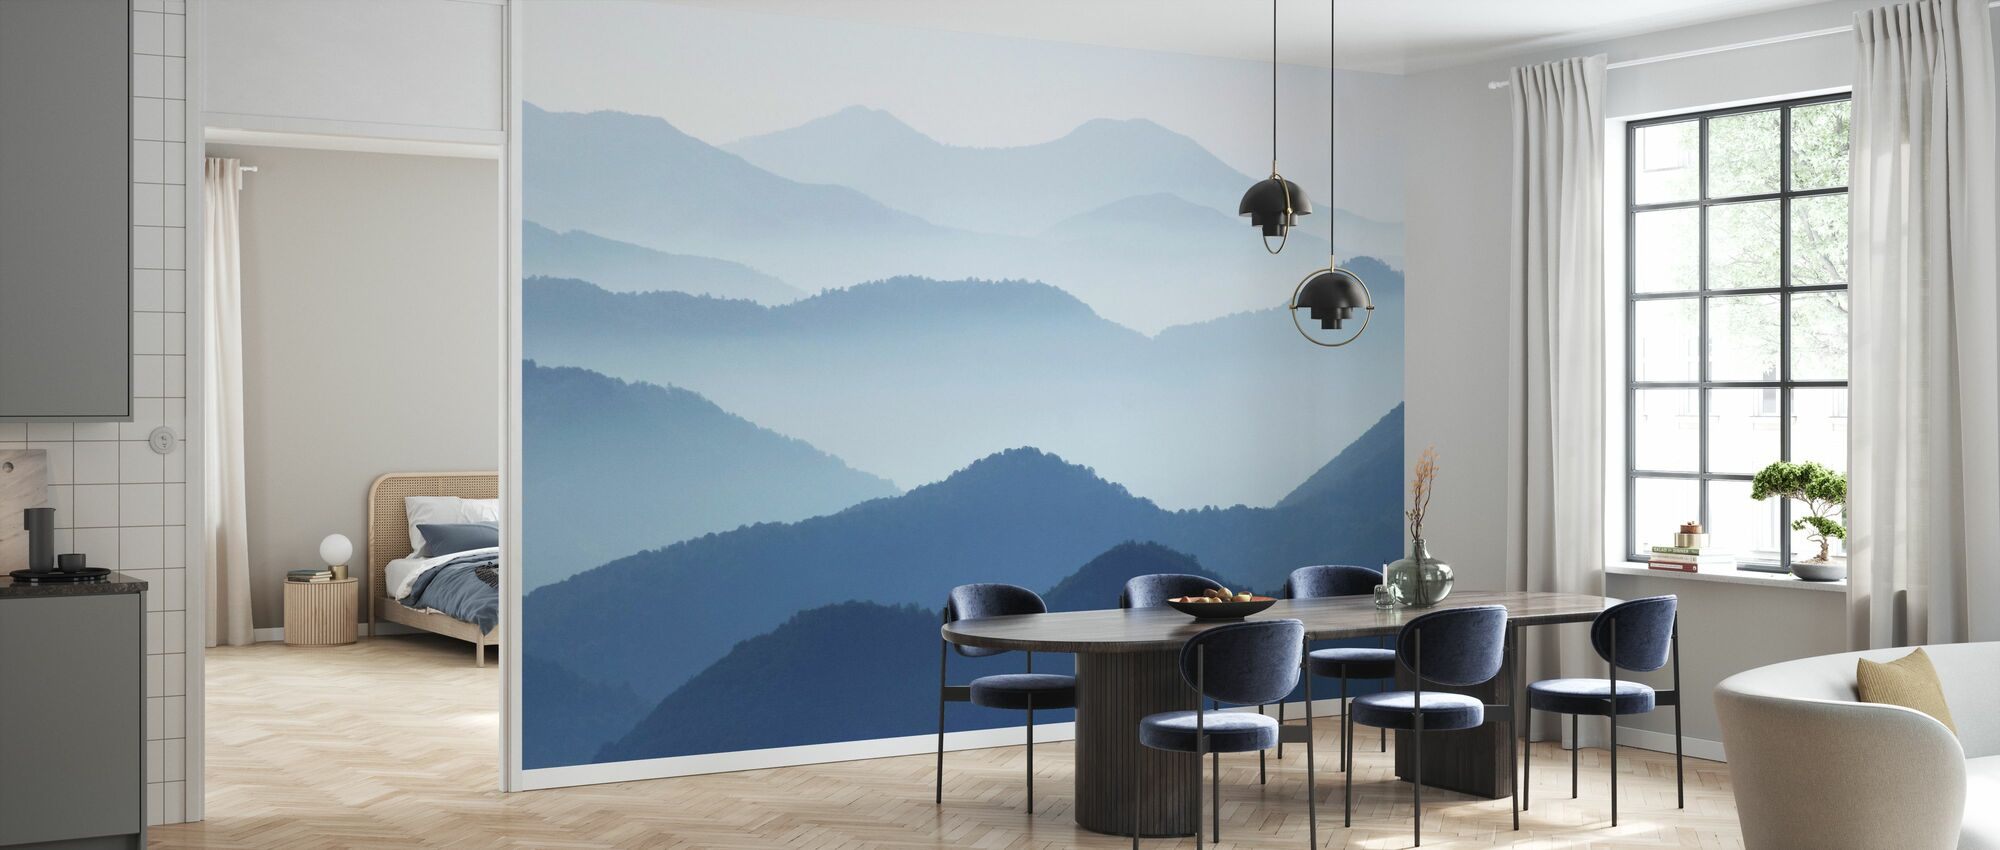 Blue Waves - Wallpaper - Kitchen